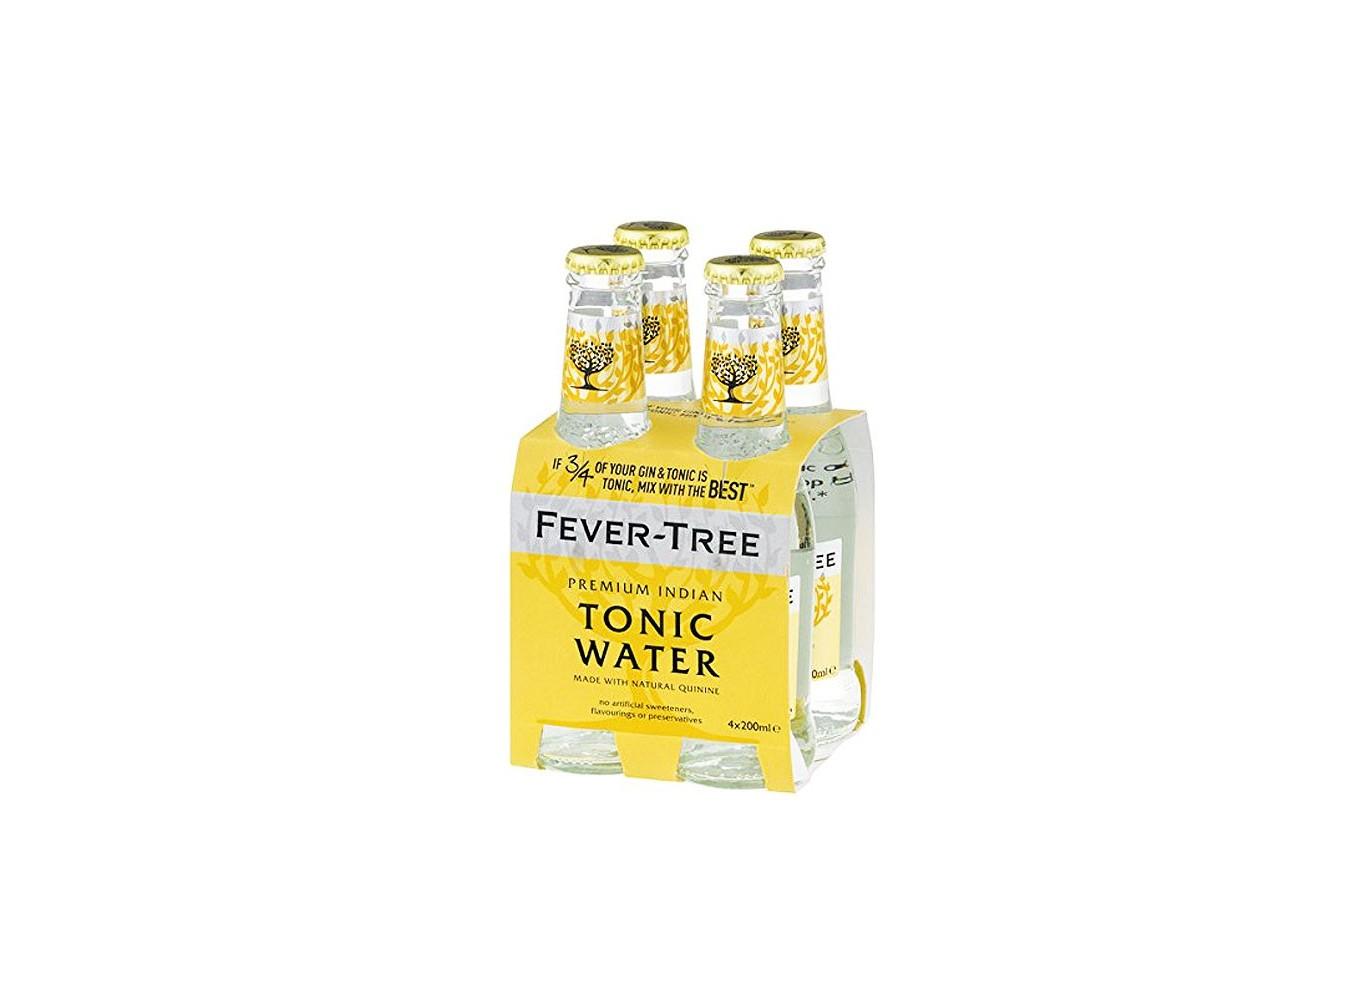 Tonica Water Fever-Tree Premium Indian Pack 4 botellas